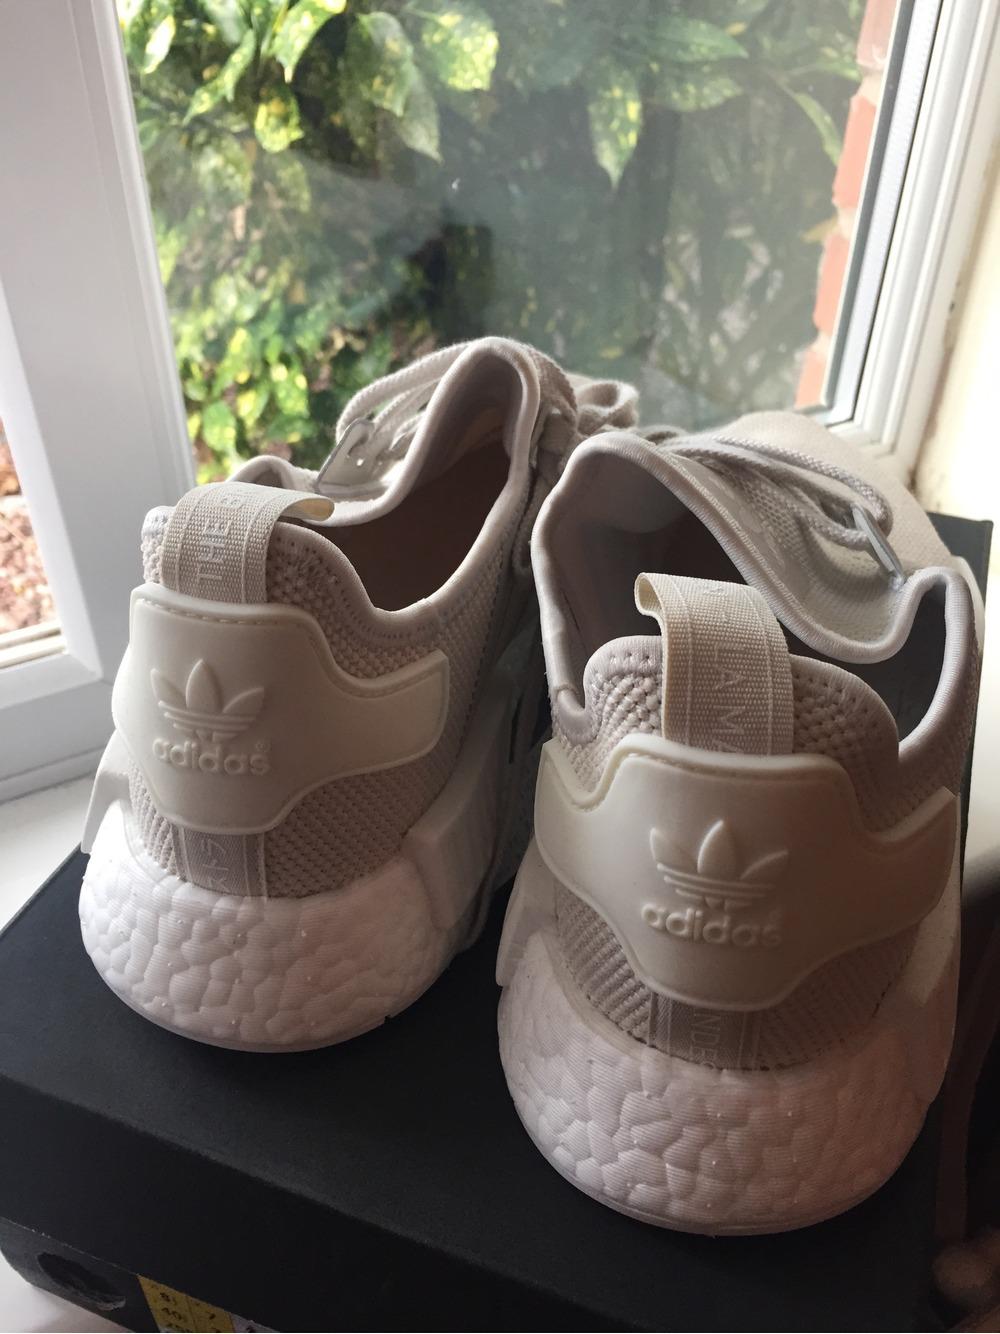 adidas NMD Runner Shoes adidas Shoes Hibbett Sports